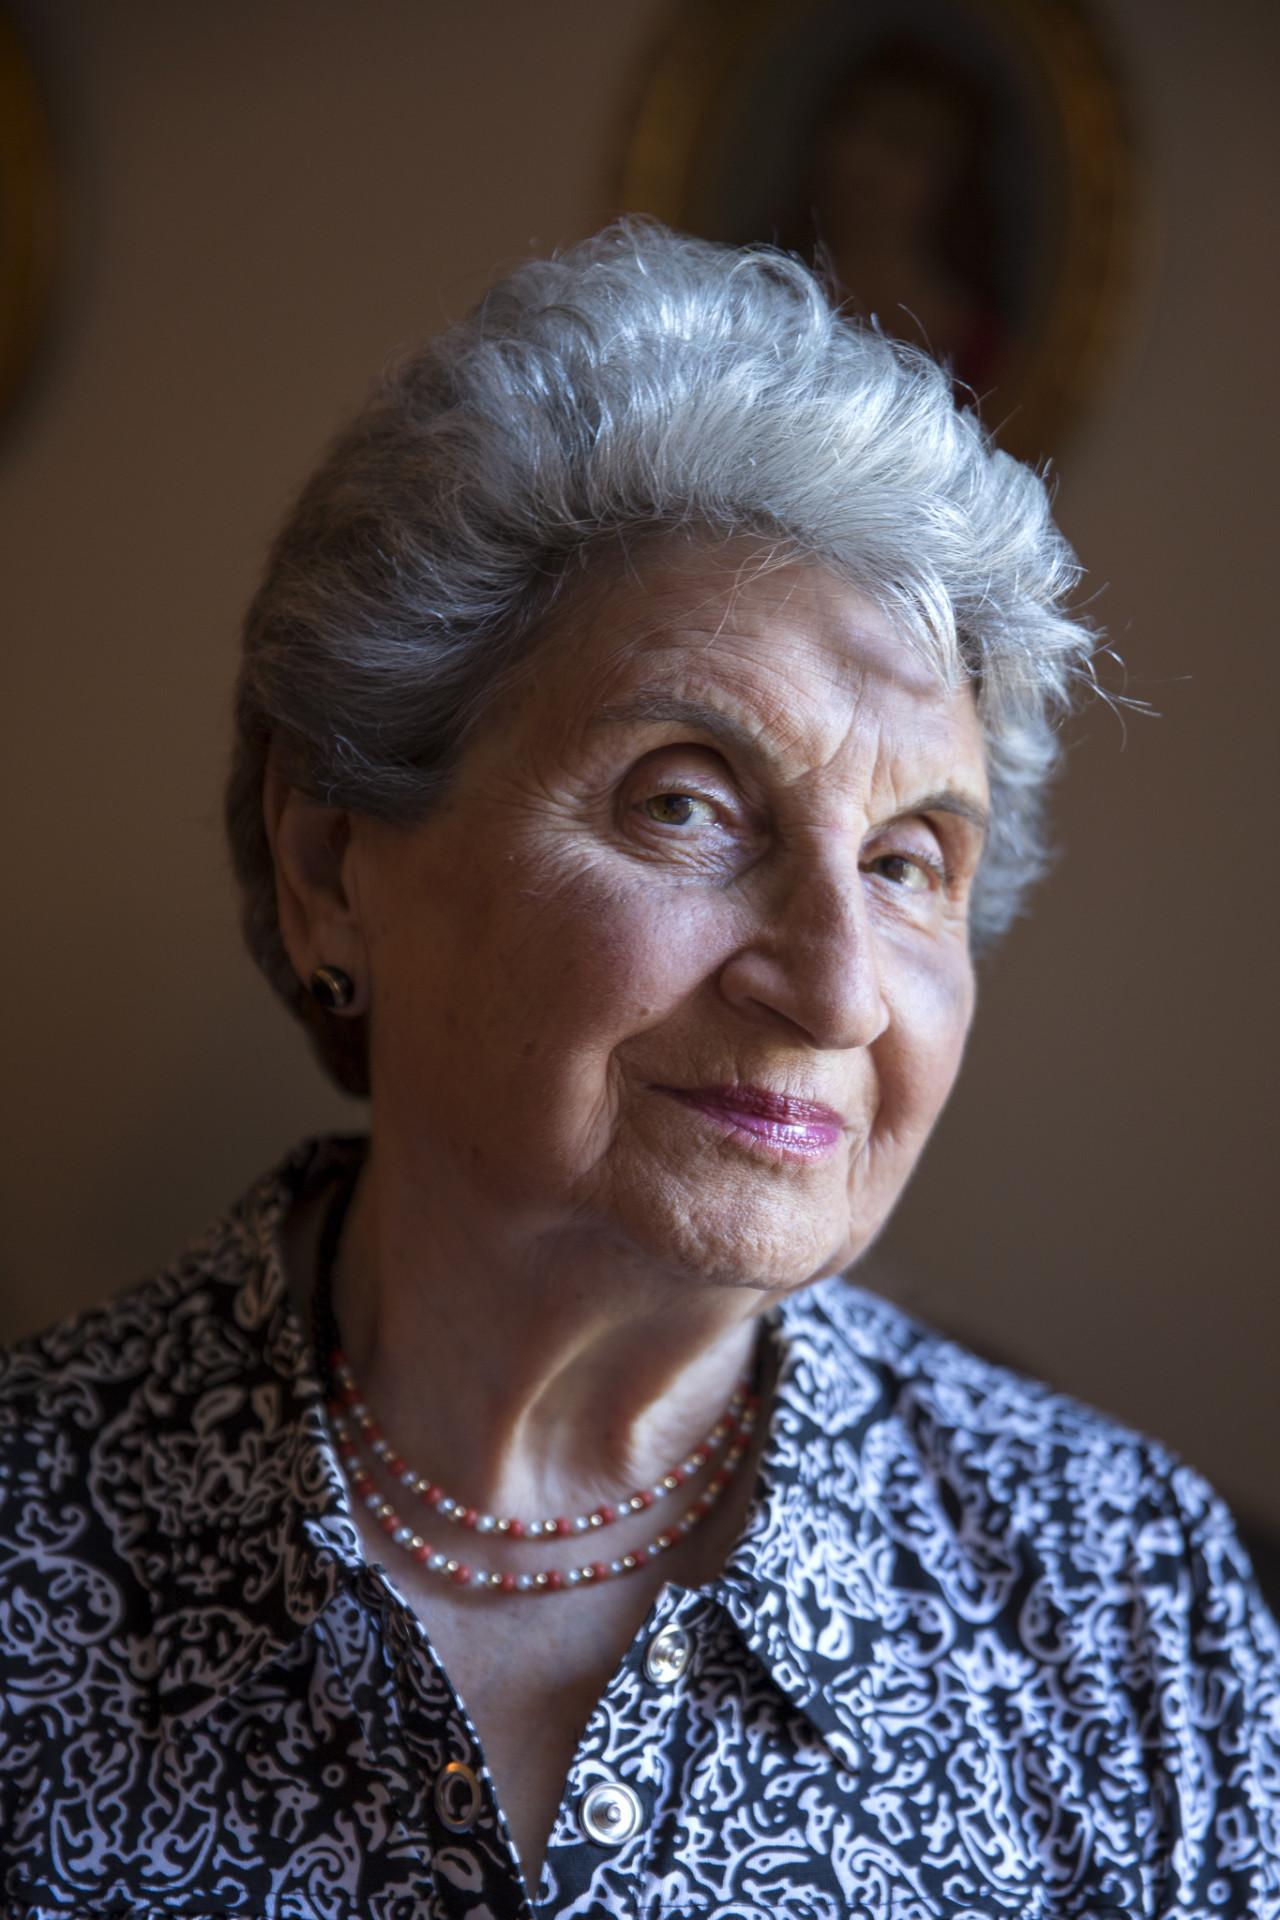 Elana Berkovits was 16 when she and her family were taken to Auschwitz.